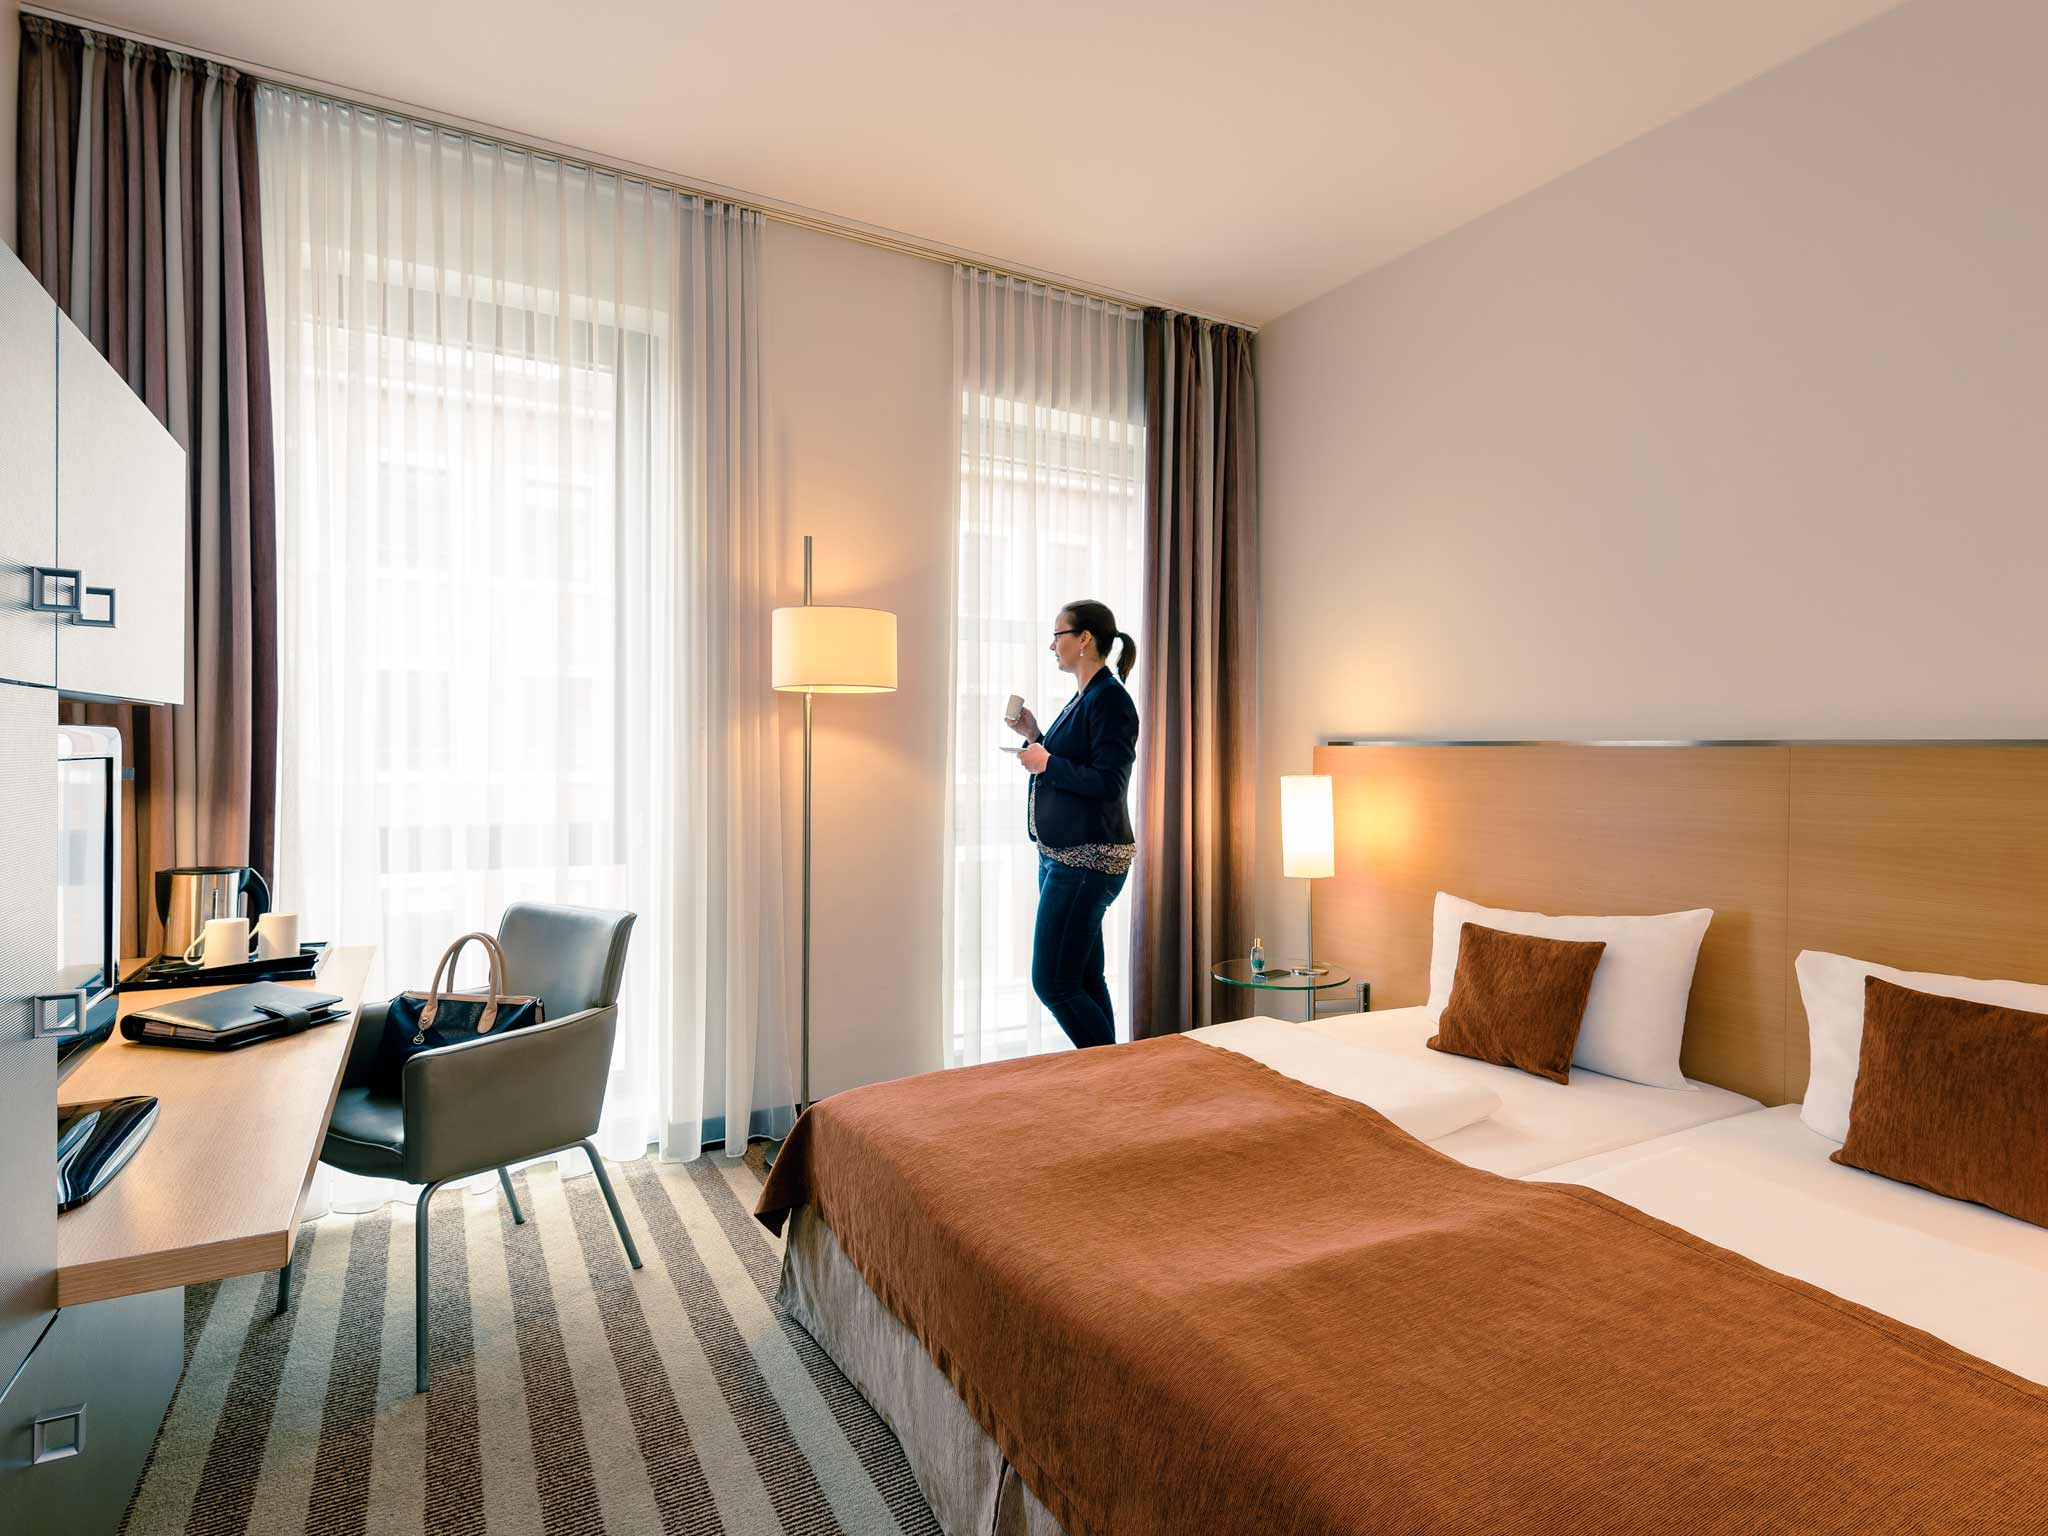 Mercure Hotel Aachen am Dom 客房视图